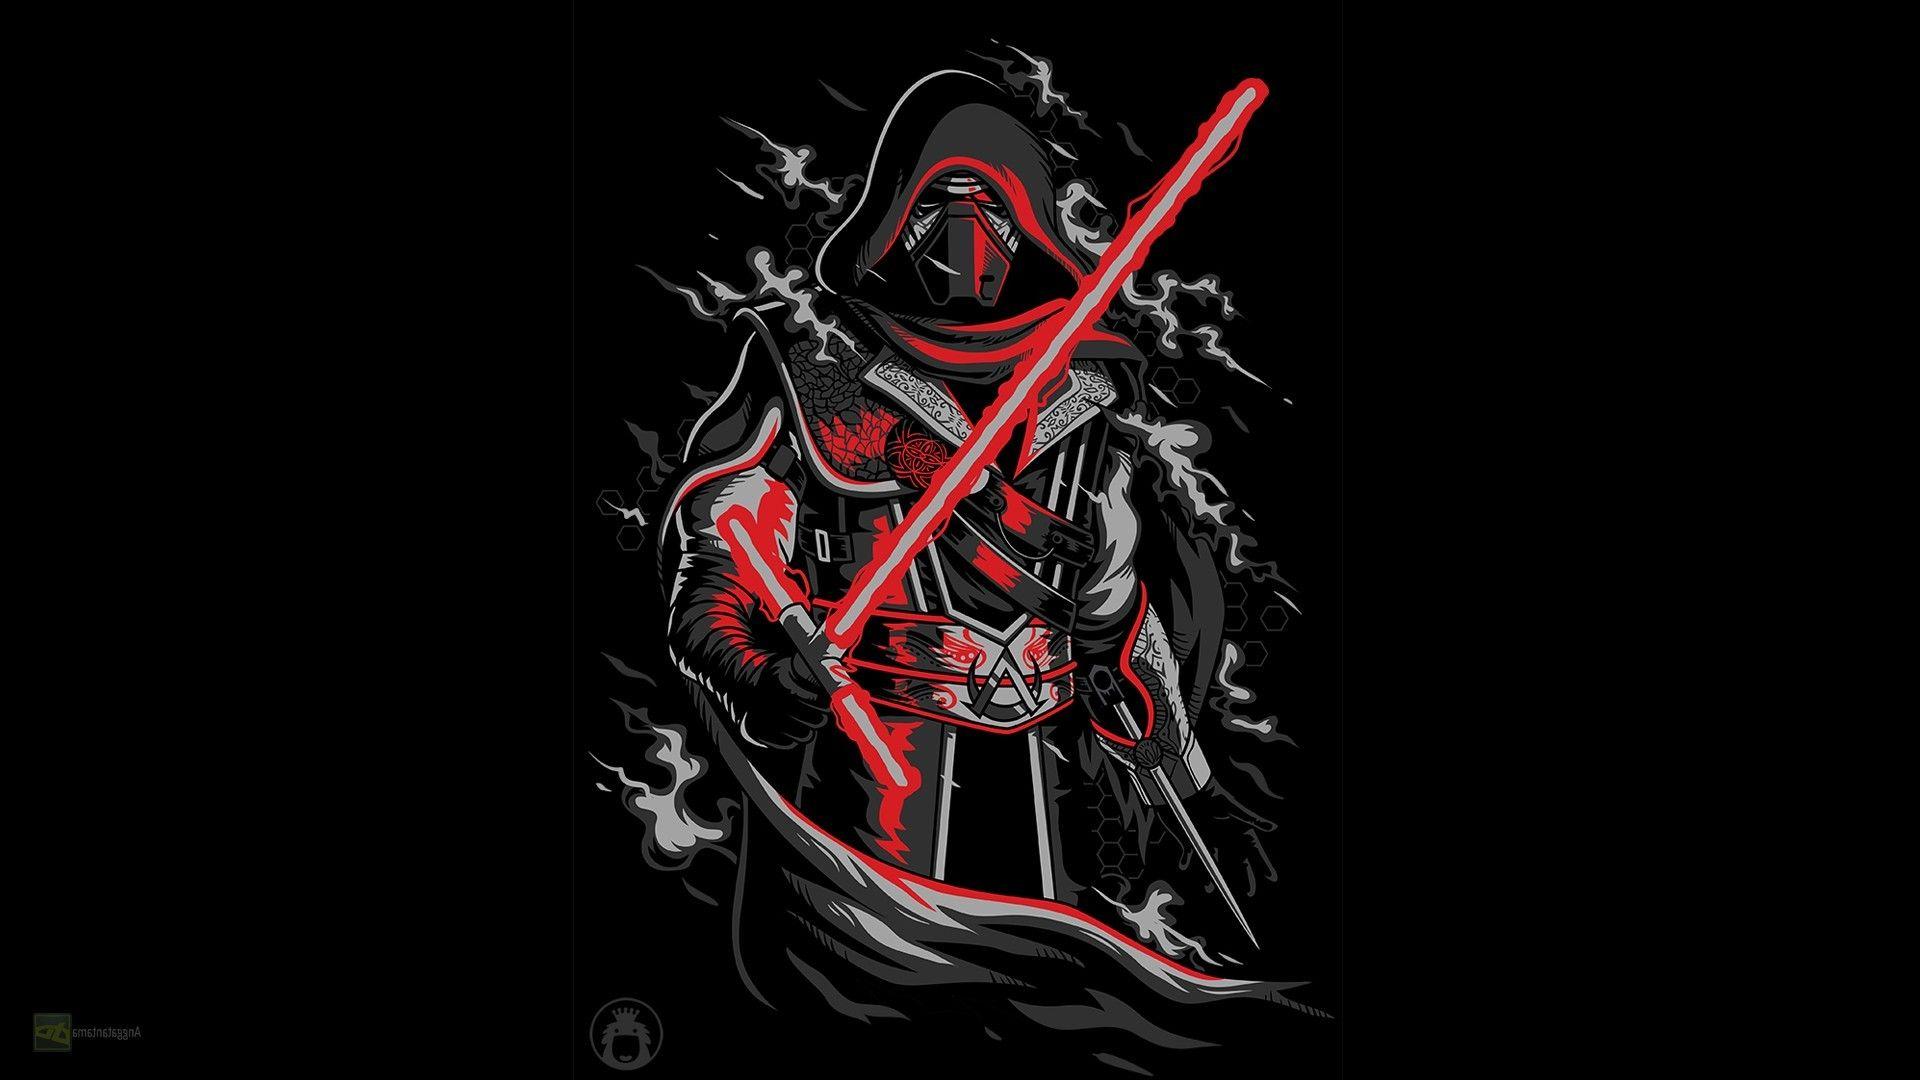 Star Wars The Force Awakens Wallpaper 3D Wallpapers